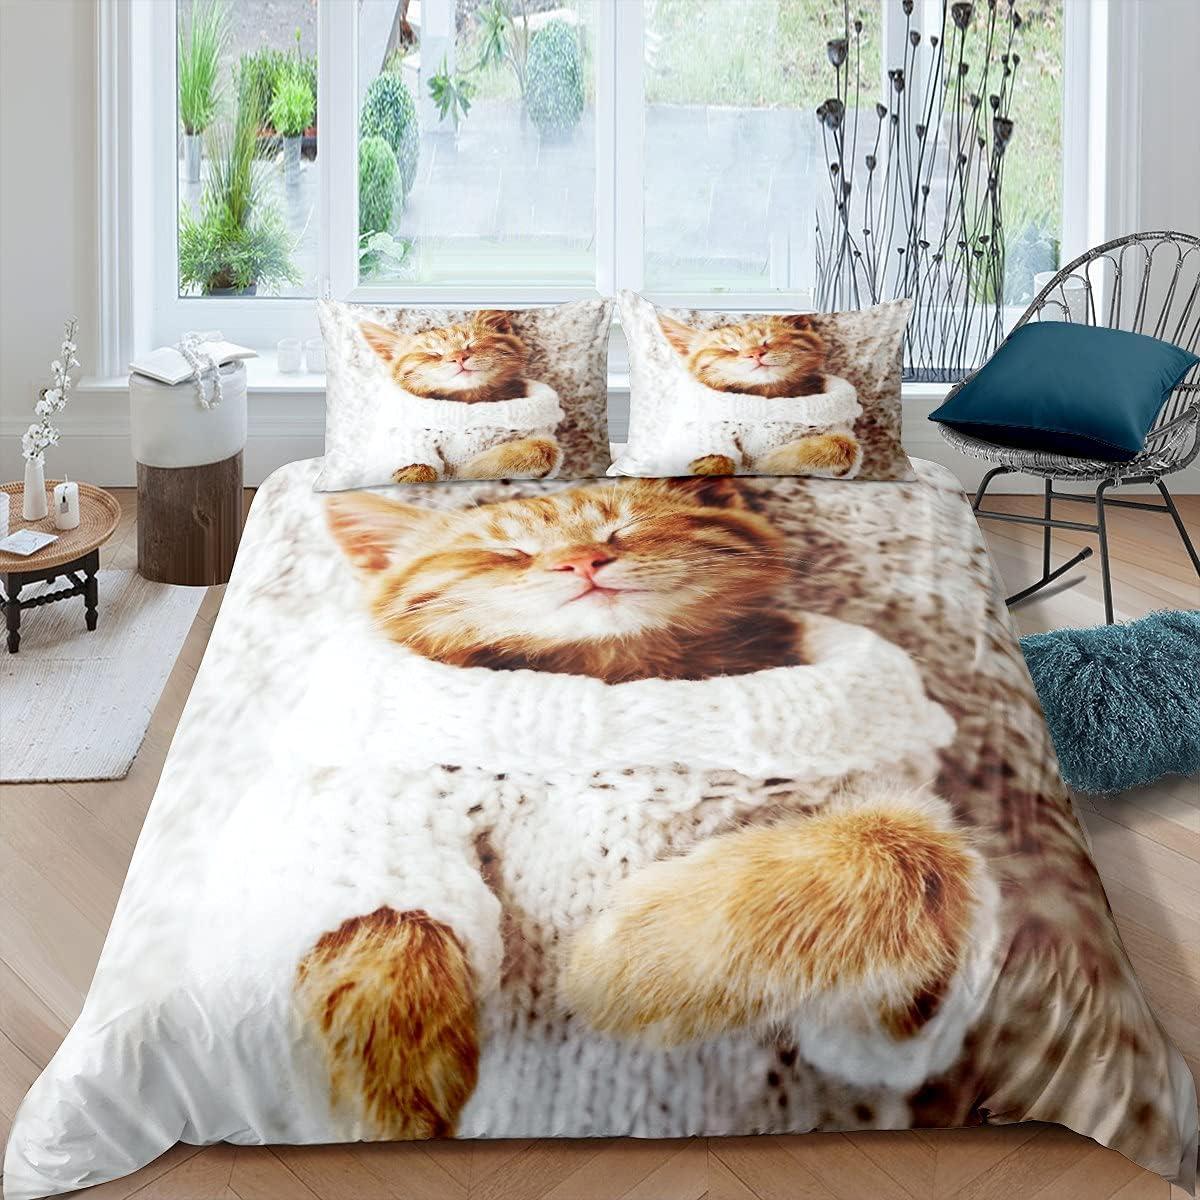 Manfei Cat Lover Comforter Cover Kitten Phoenix Mall Special Campaign Queen Size Sleeping Duve